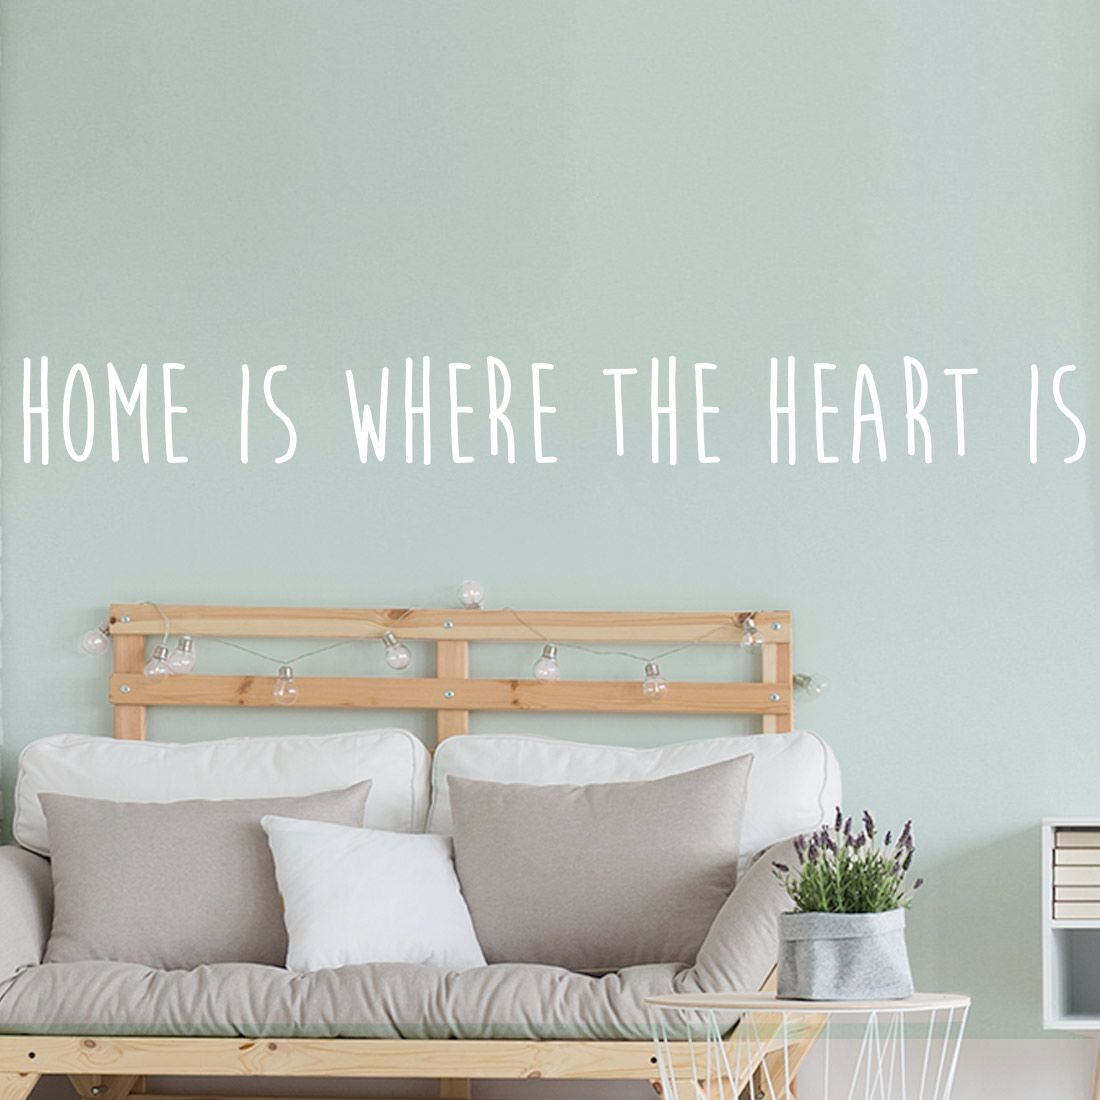 Home is where the heart is muursticker | Woonkamer muurstickers ...